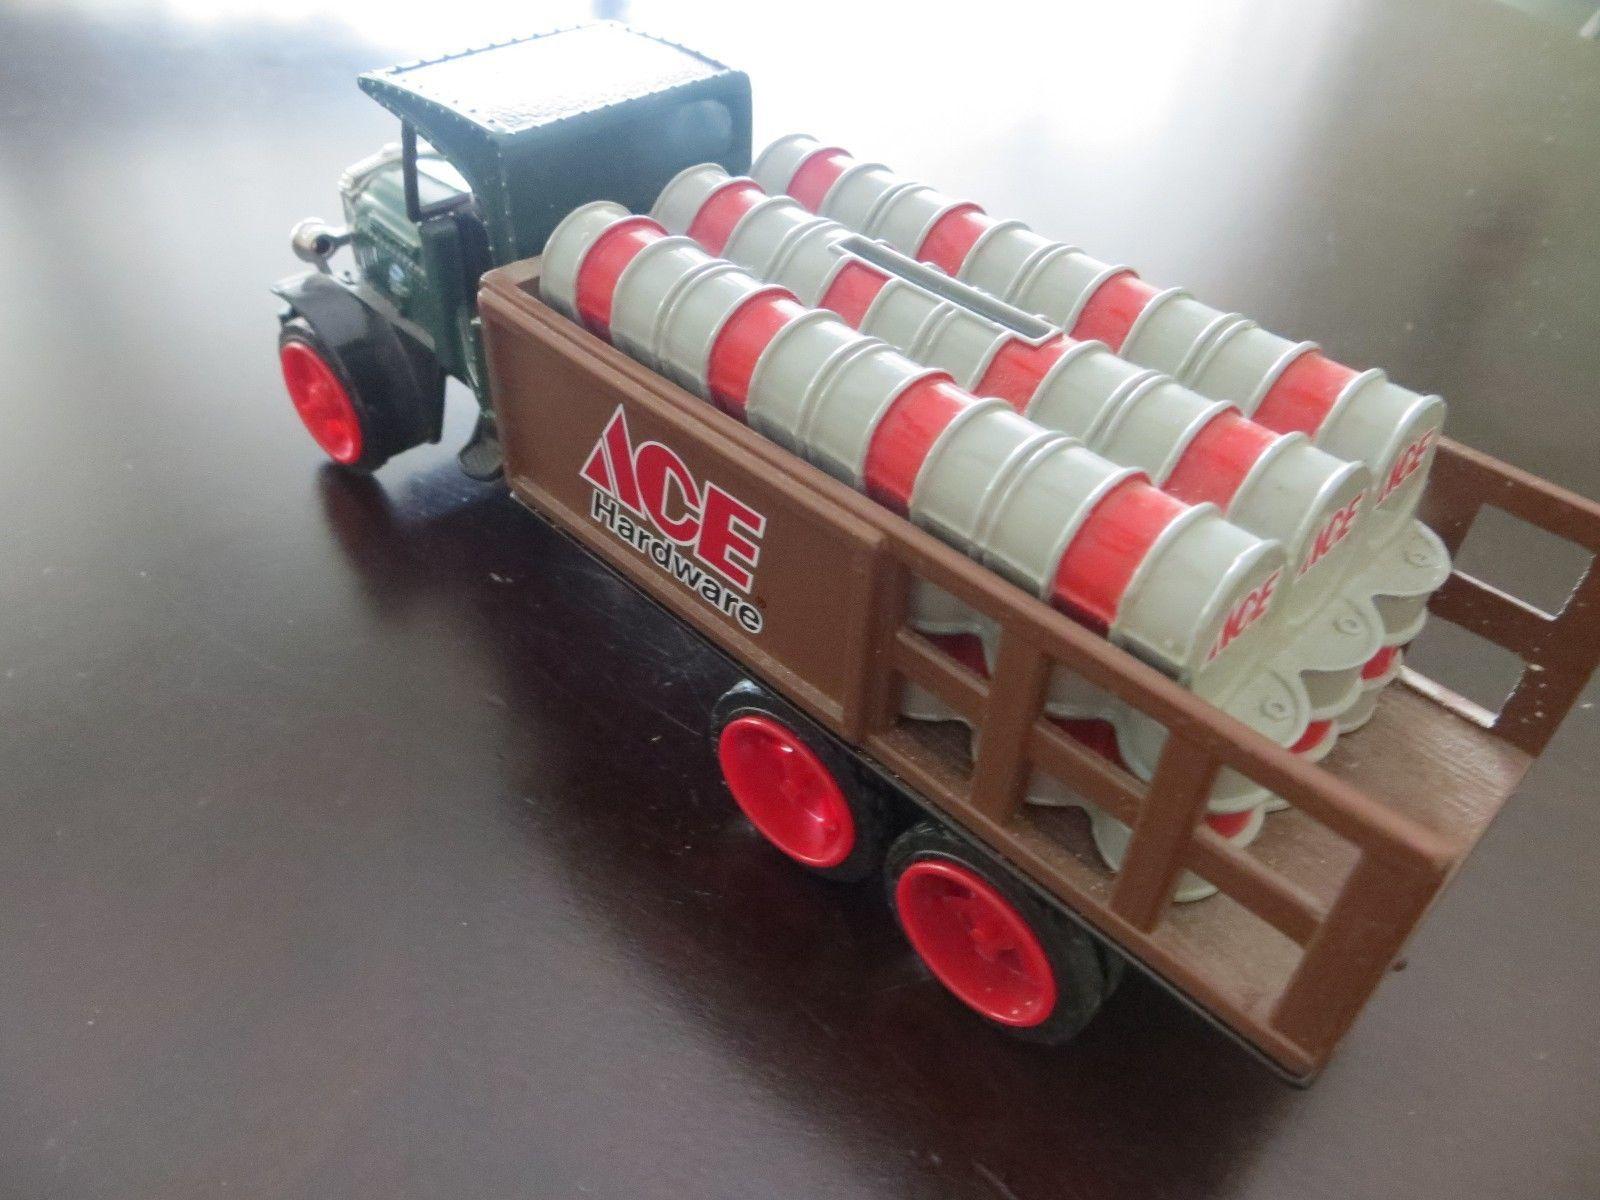 ERTL - 1925 - Ace Hardware Kenworth Truck - and 50 similar items